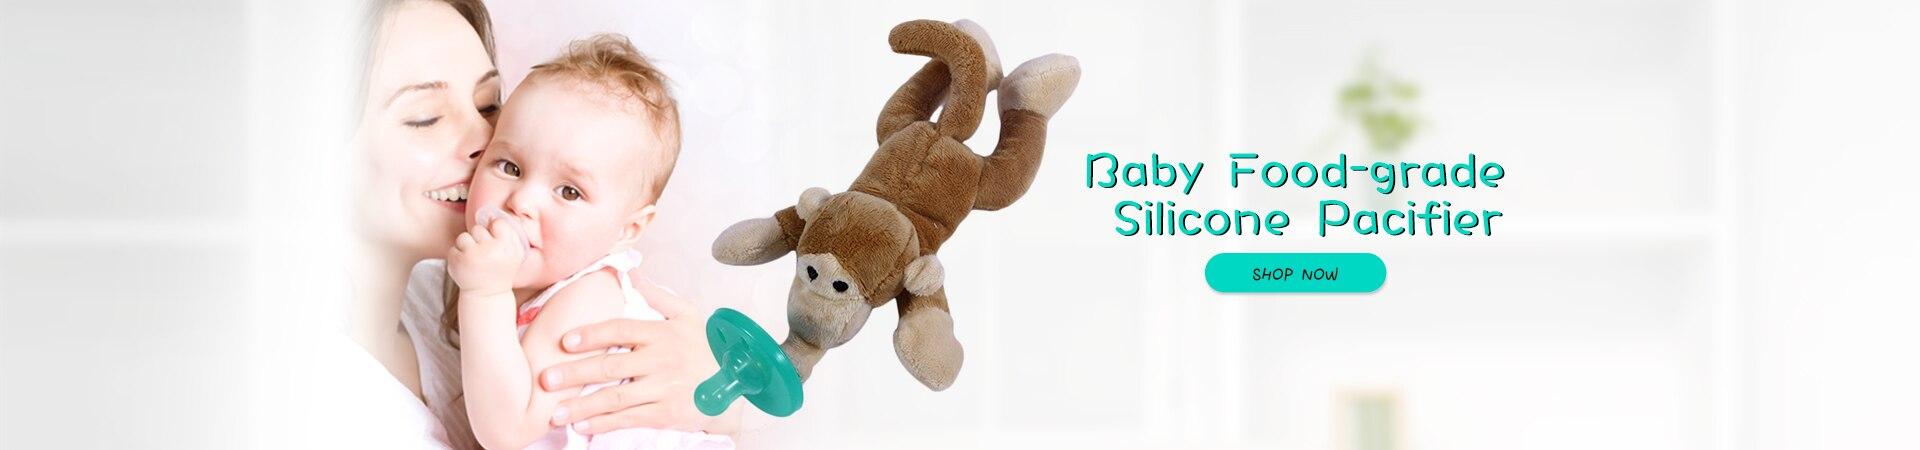 Fshion Motherbaby Store Small Orders Online Hot Selling Mom N Bab Socks 3in1 Girl Animal